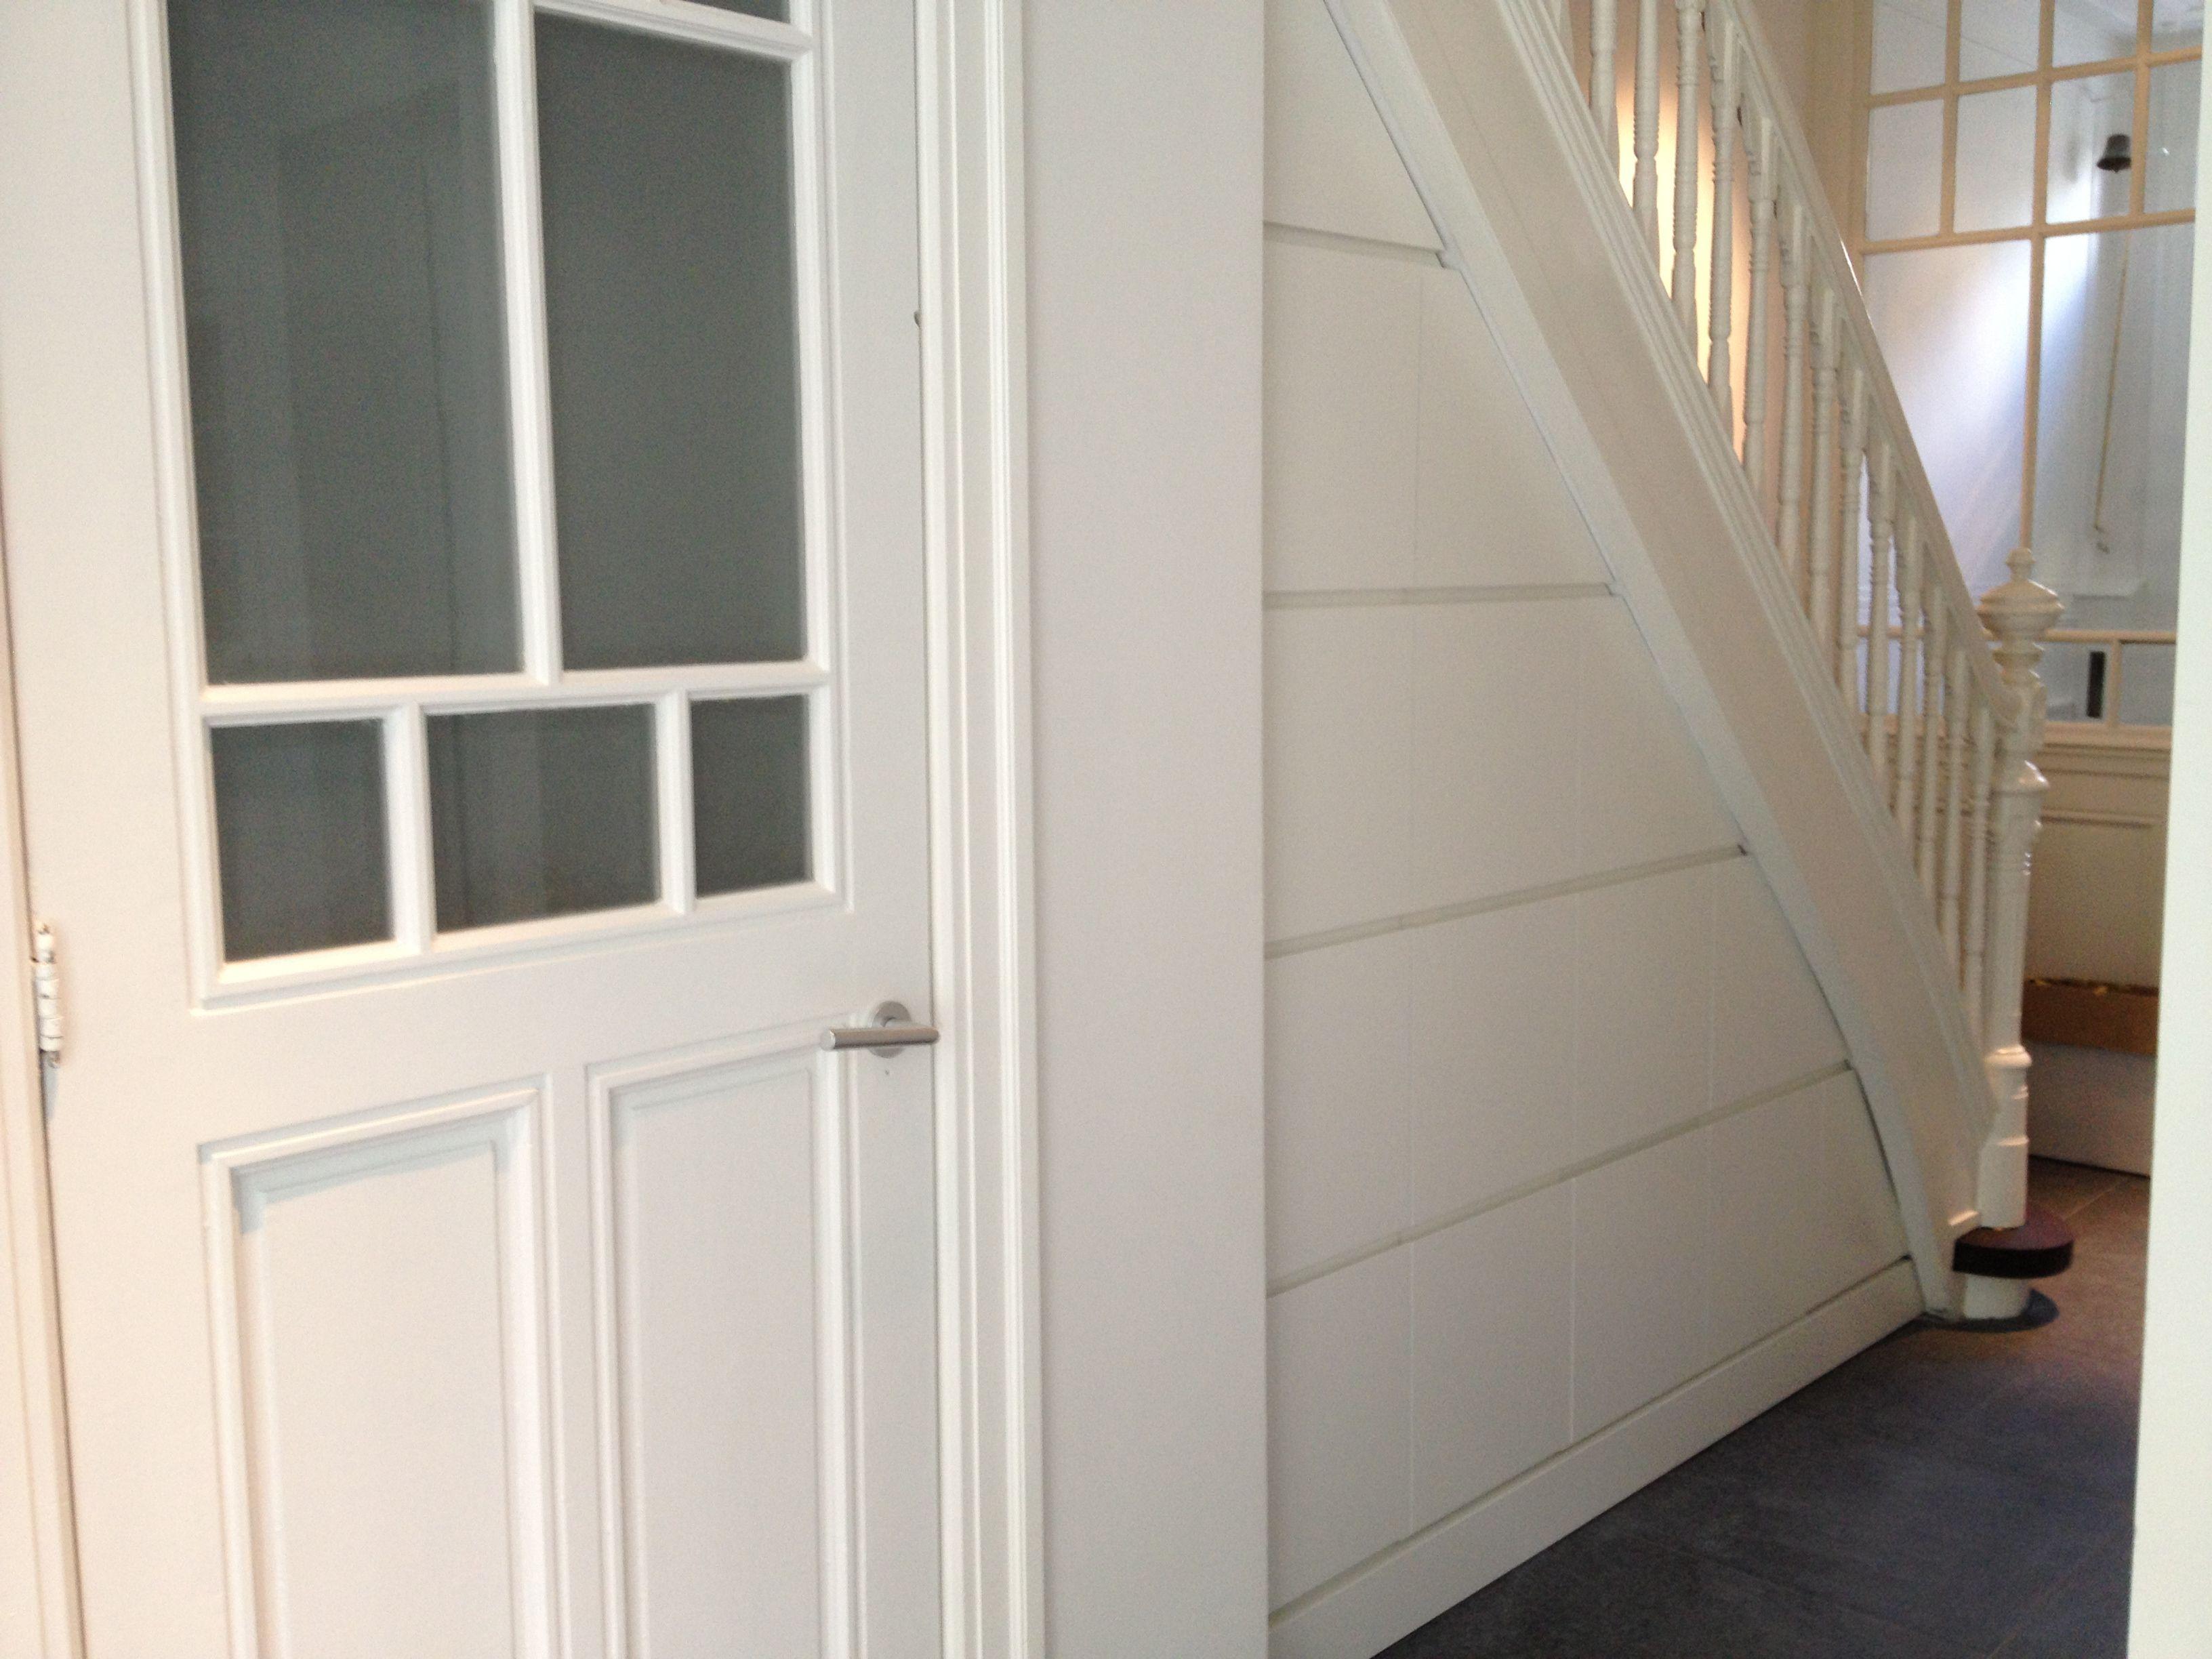 Trap onderbouw delade interieur bouw projecten delade